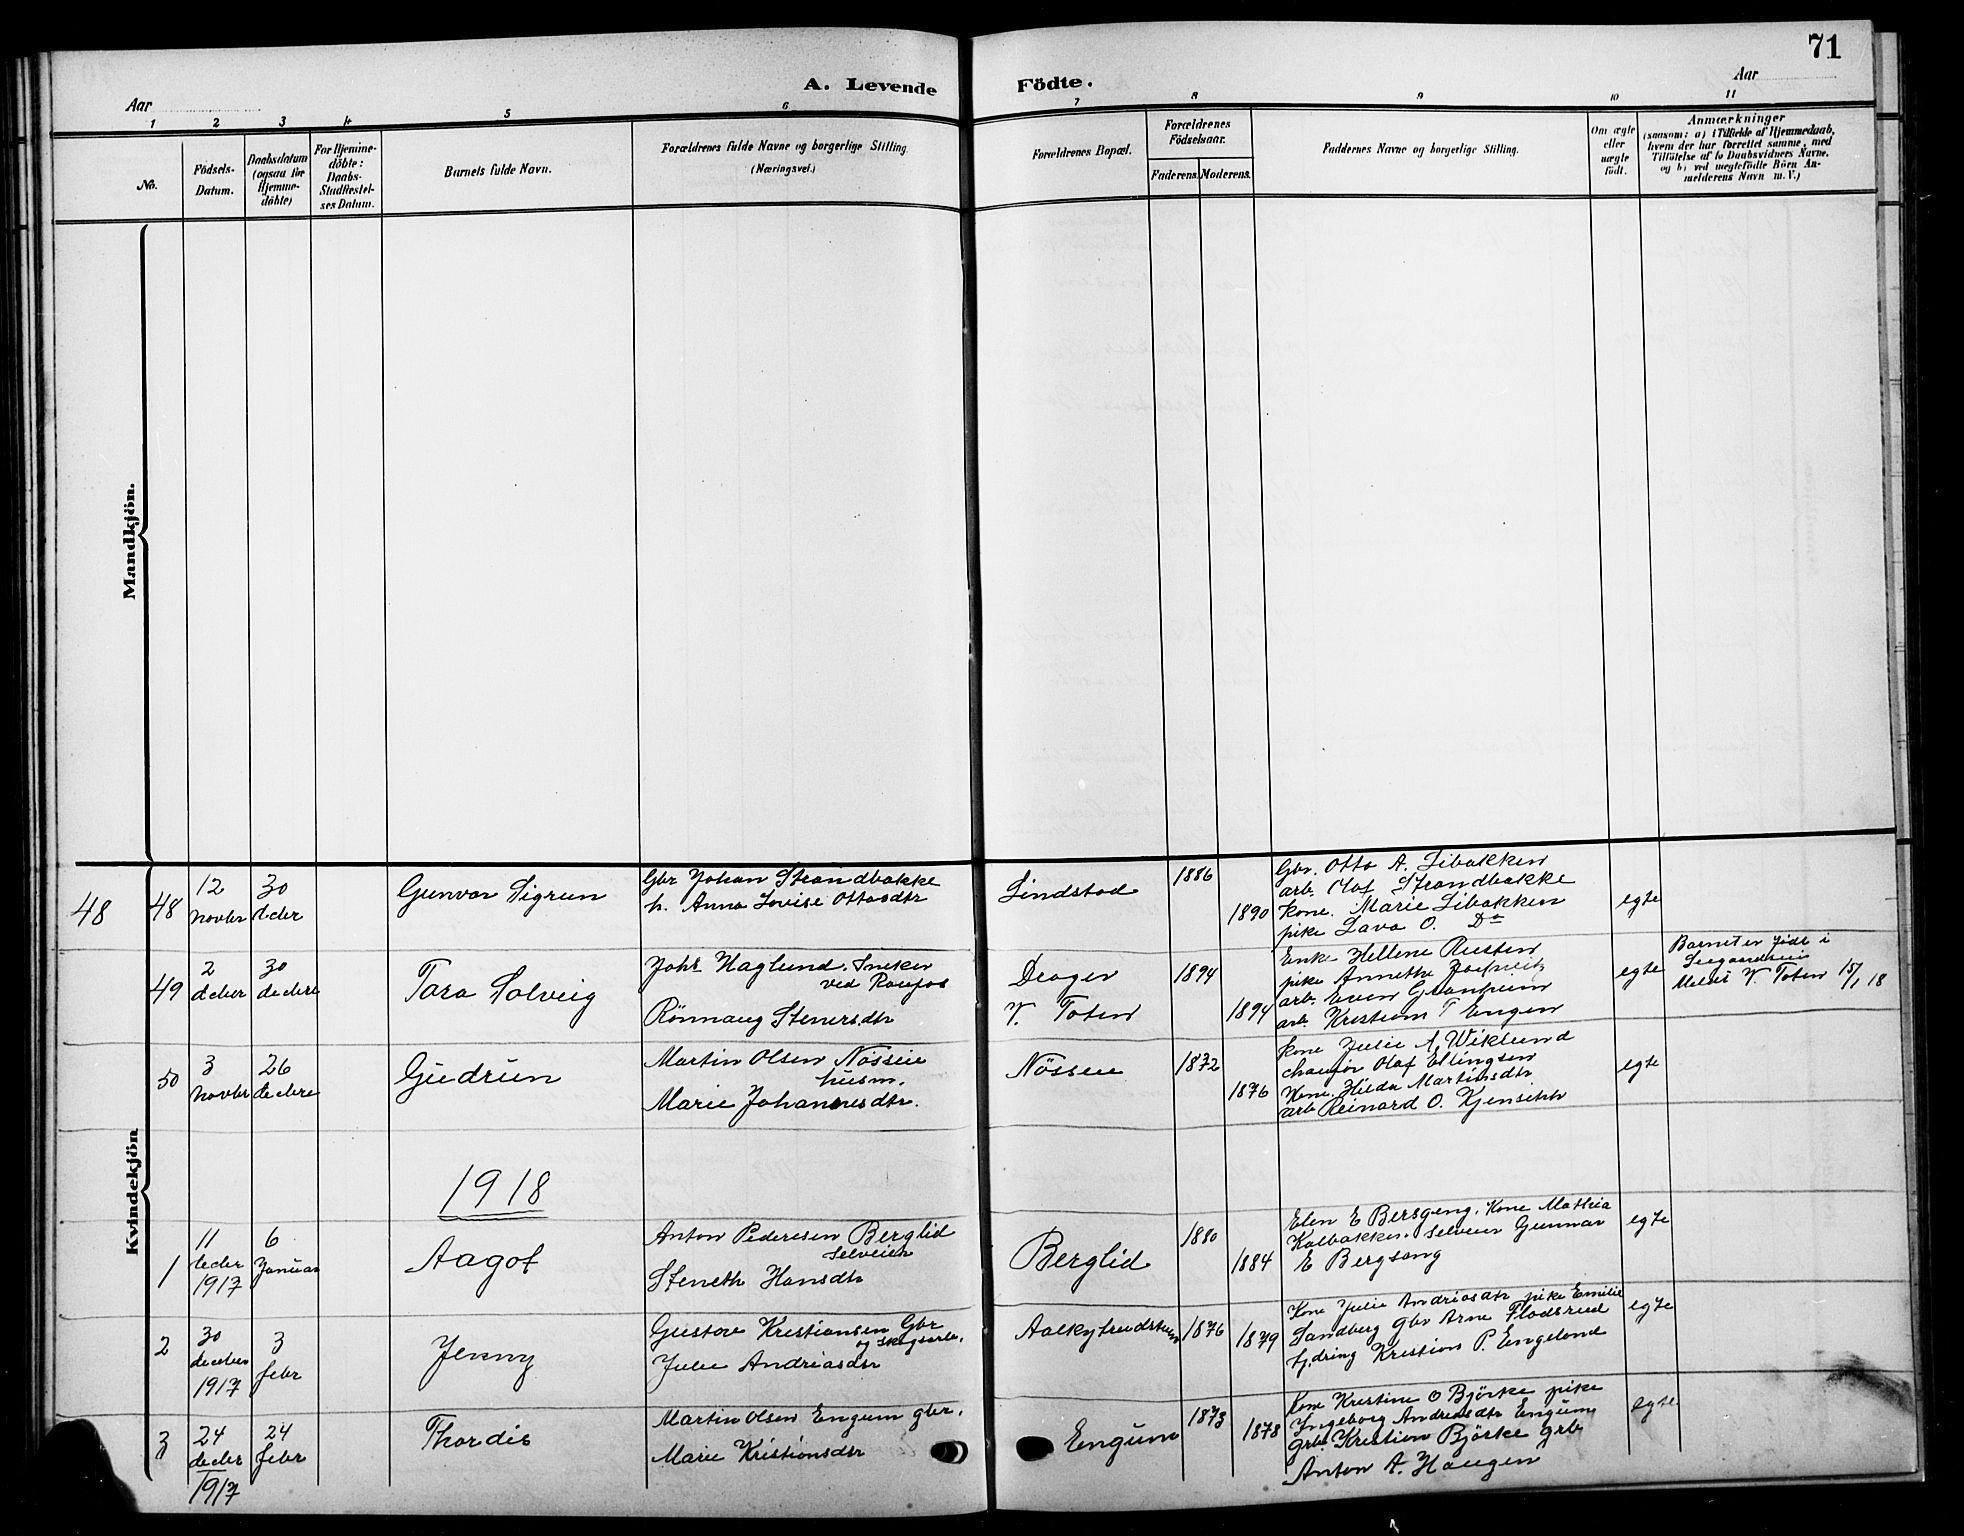 SAH, Biri prestekontor, Klokkerbok nr. 5, 1906-1919, s. 71